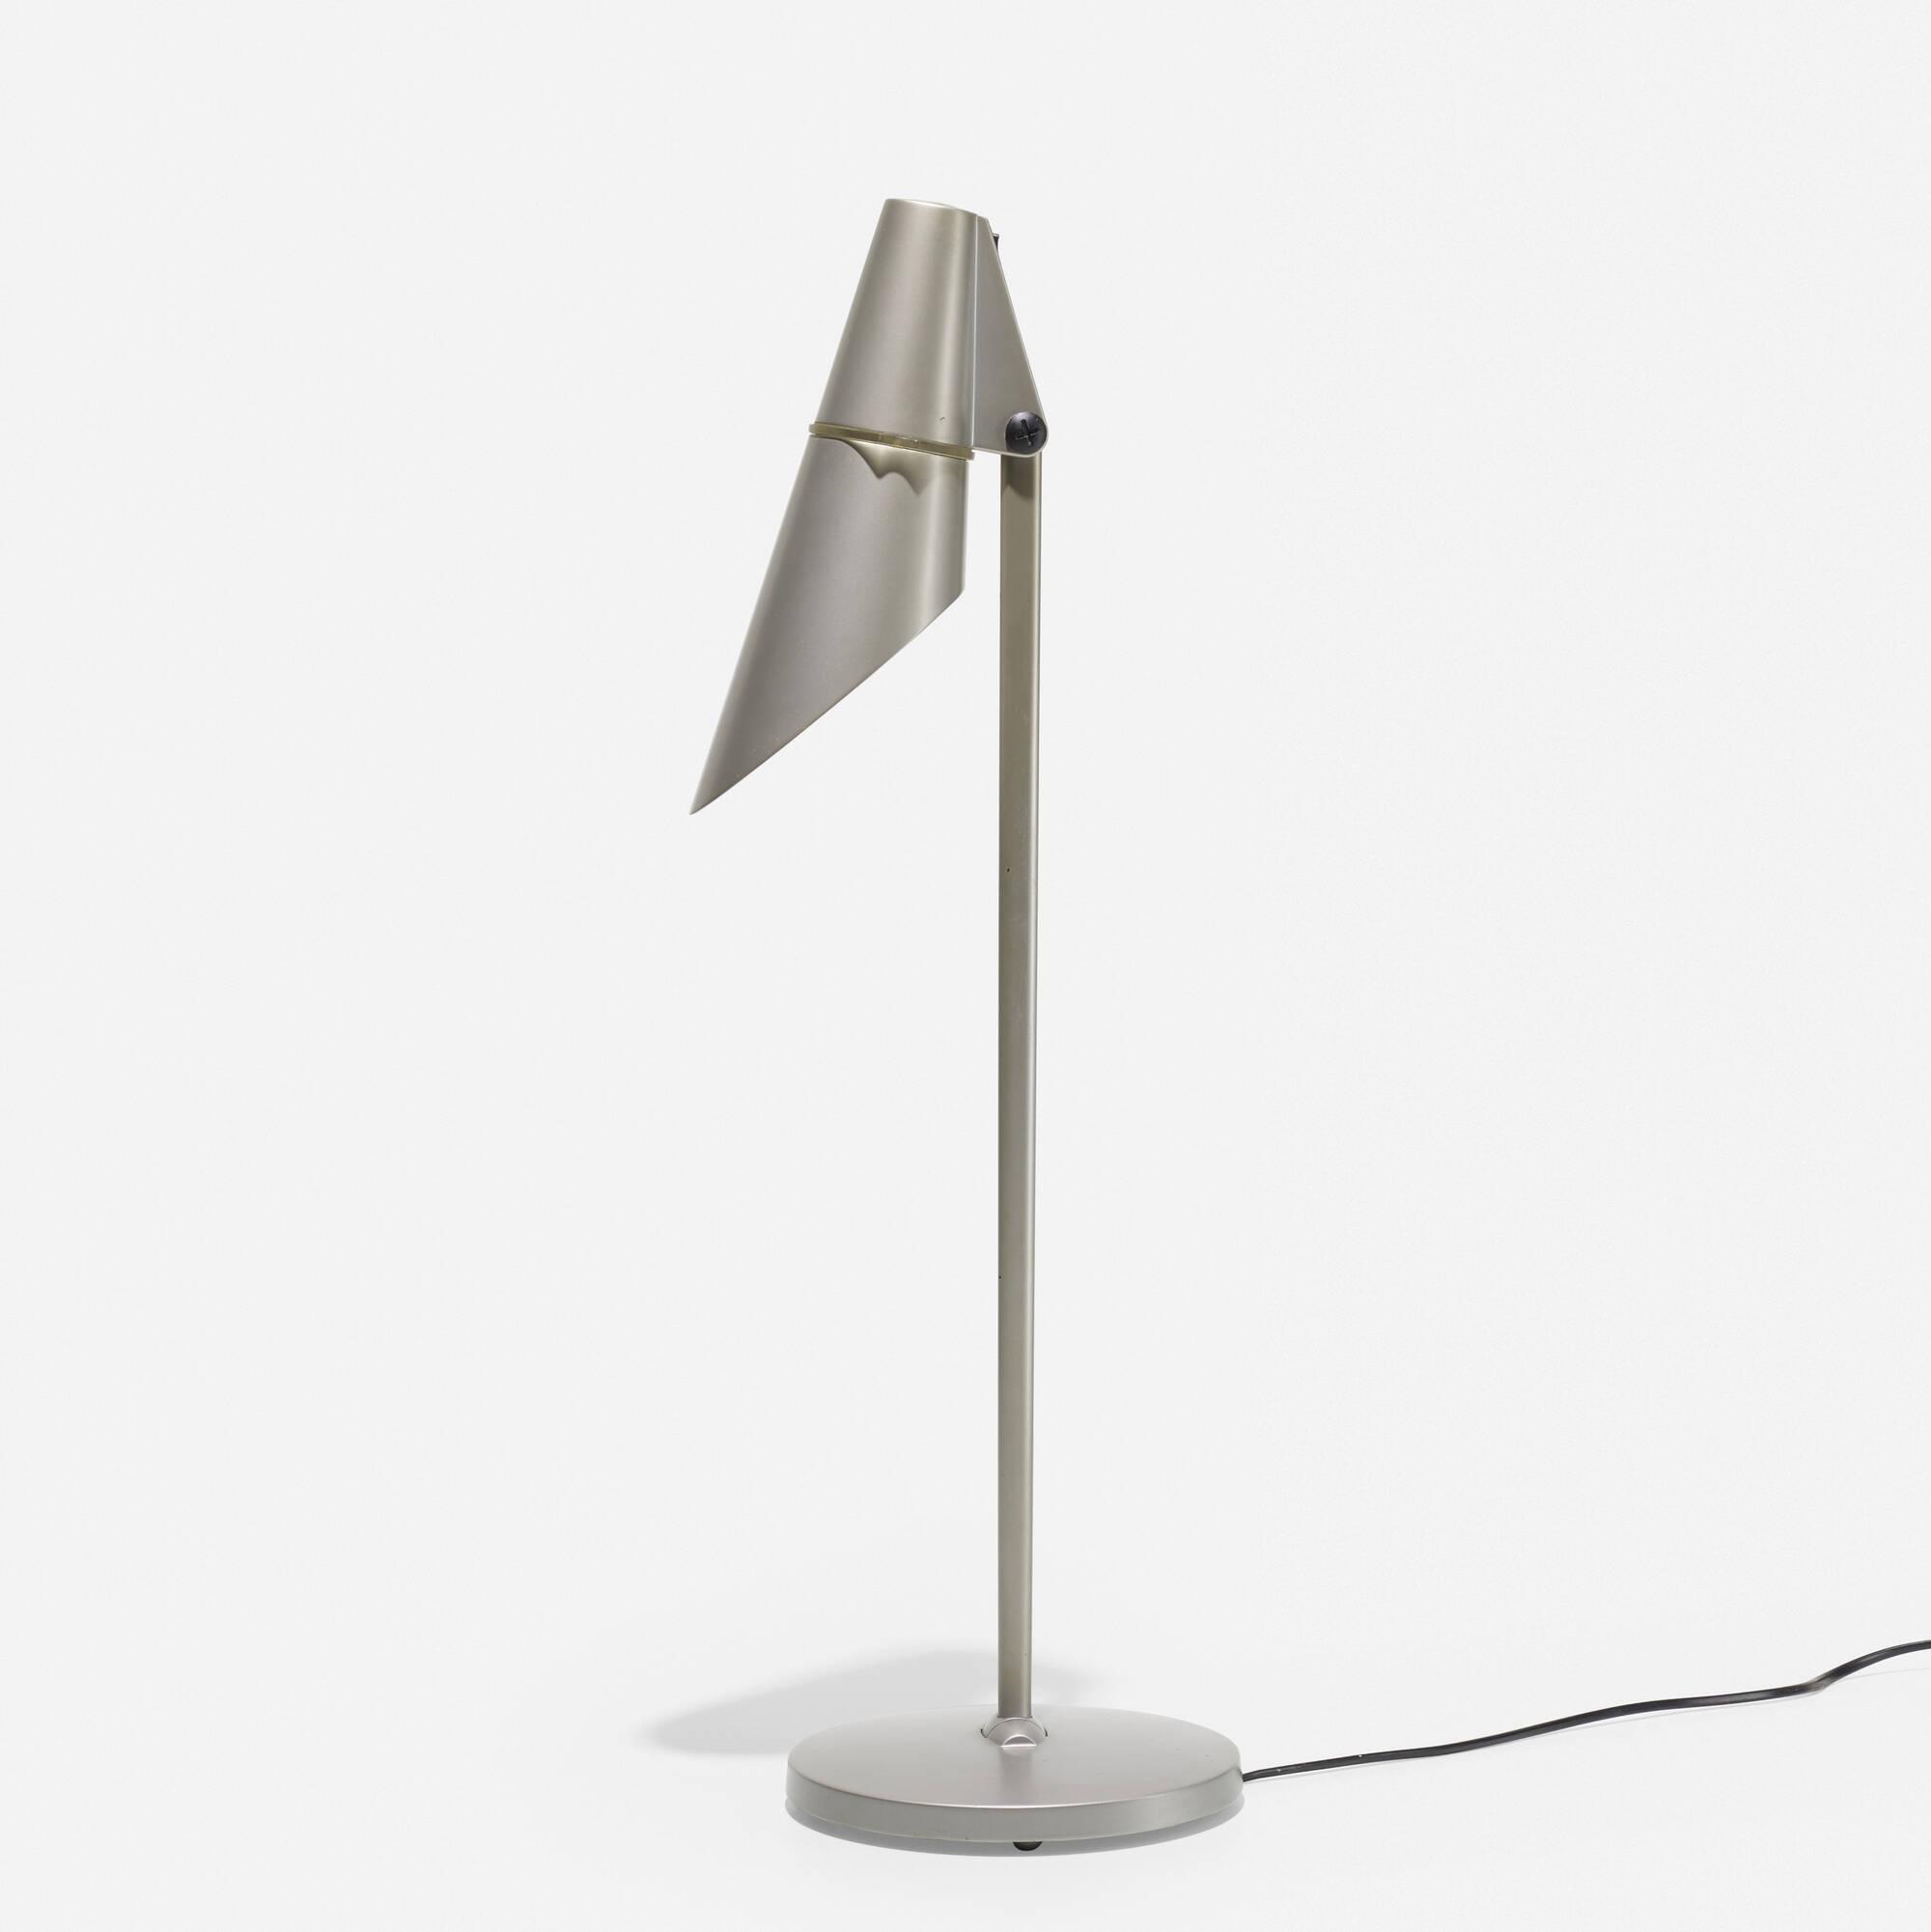 315: Hannes Wettstein / Spy table lamp (2 of 3)